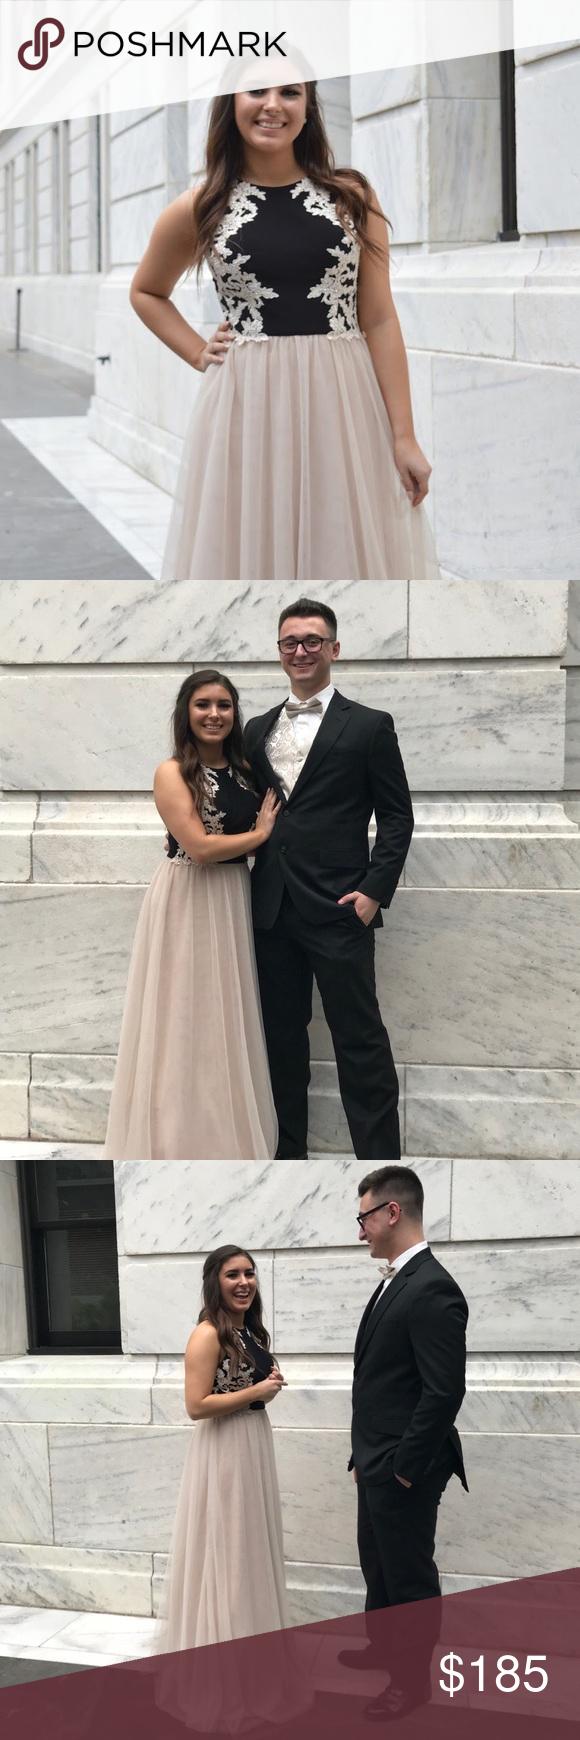 Windsor prom dress in uquotesu pinterest prom dresses